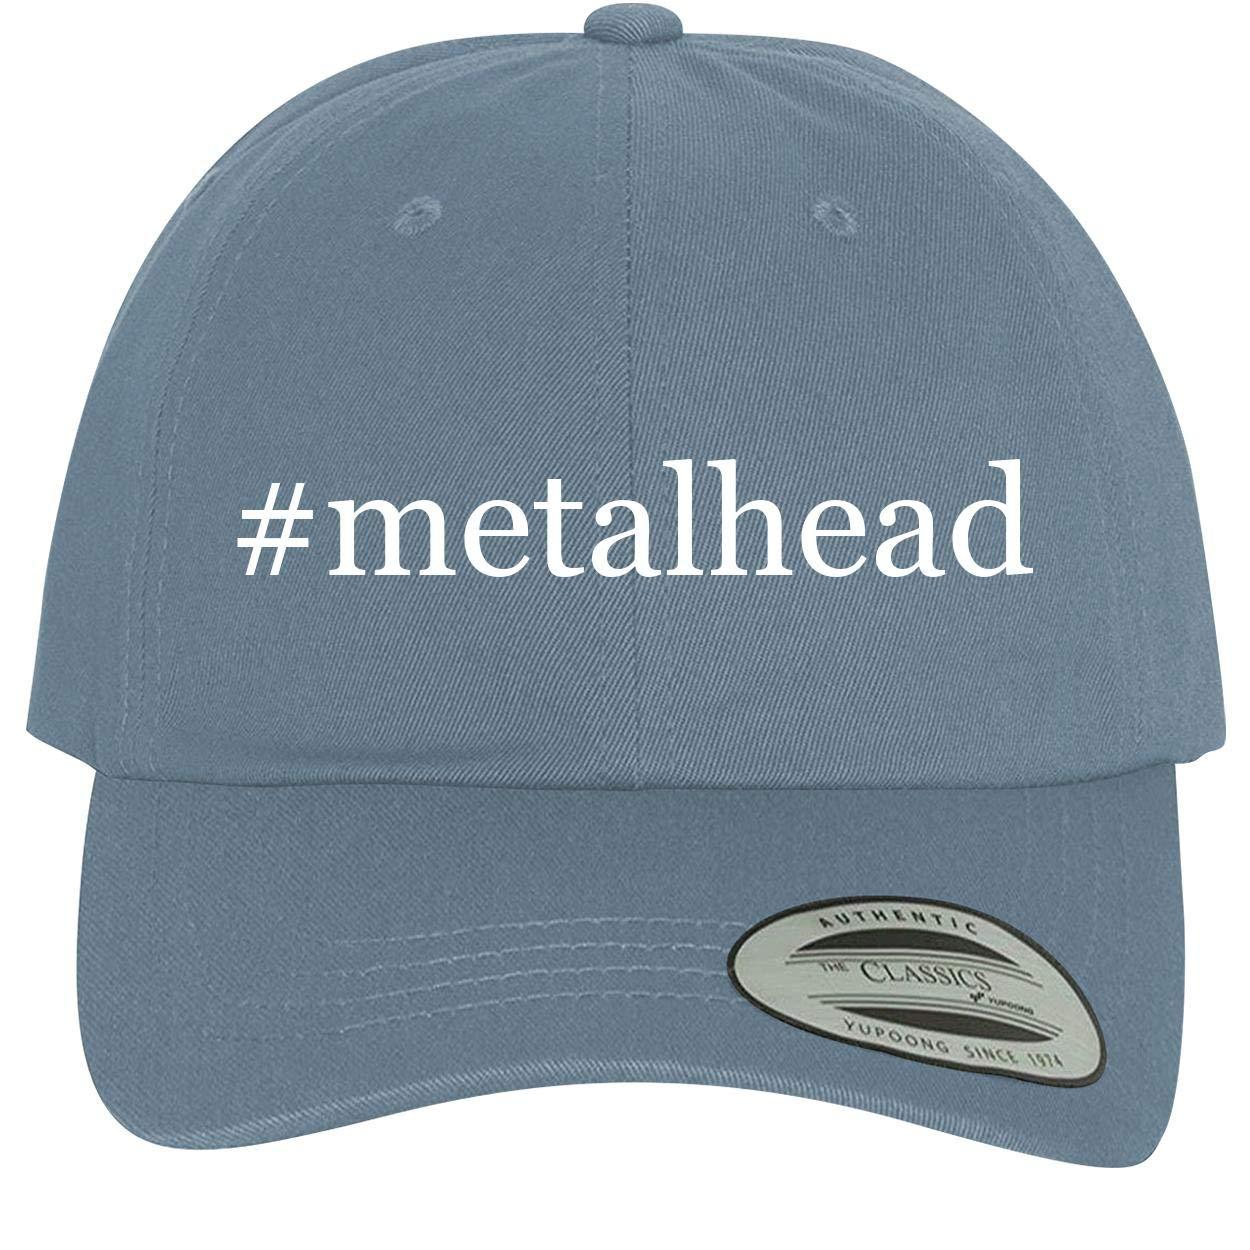 BH Cool Designs #Metalhead Comfortable Dad Hat Baseball Cap